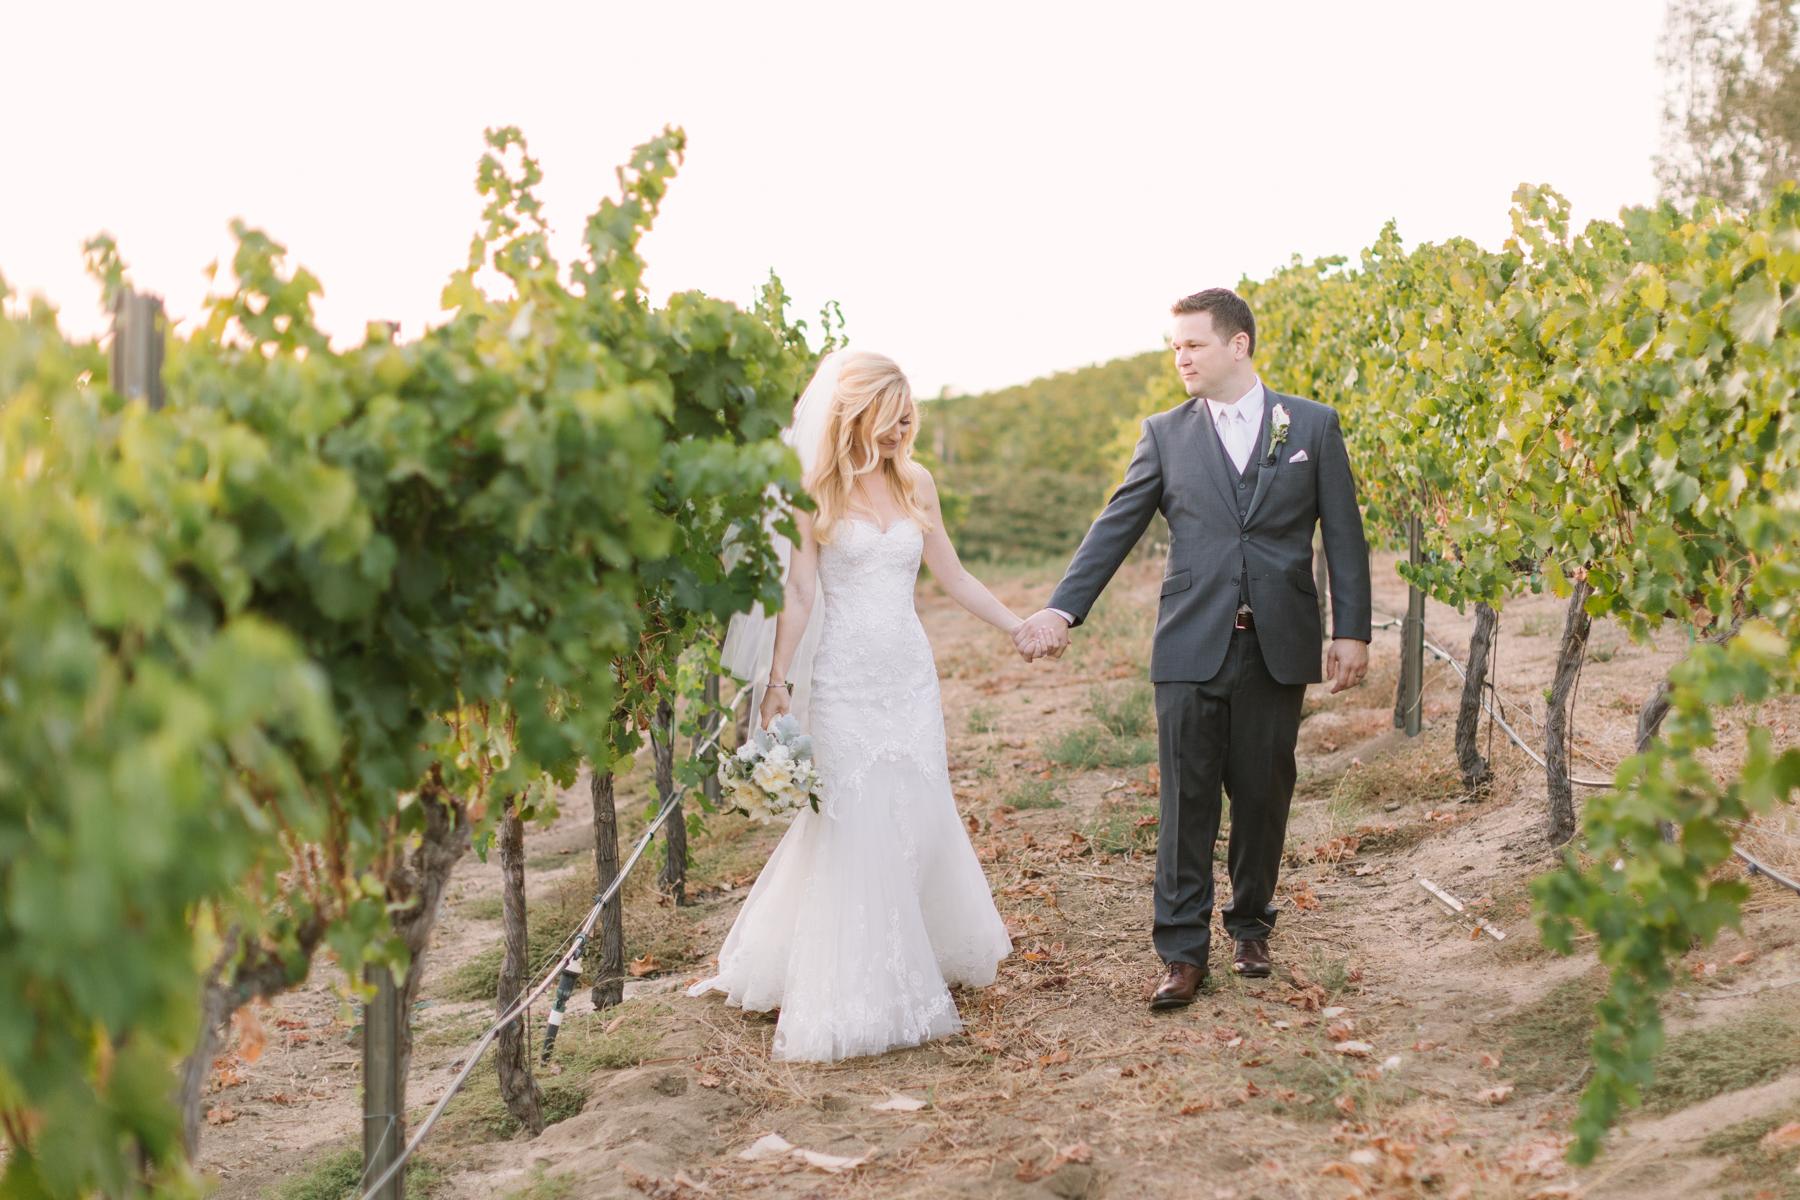 Orange-County-Wedding-Photography-Brianna-Caster-and-Co-Photographers-Falkner-Winery-Wedding-9